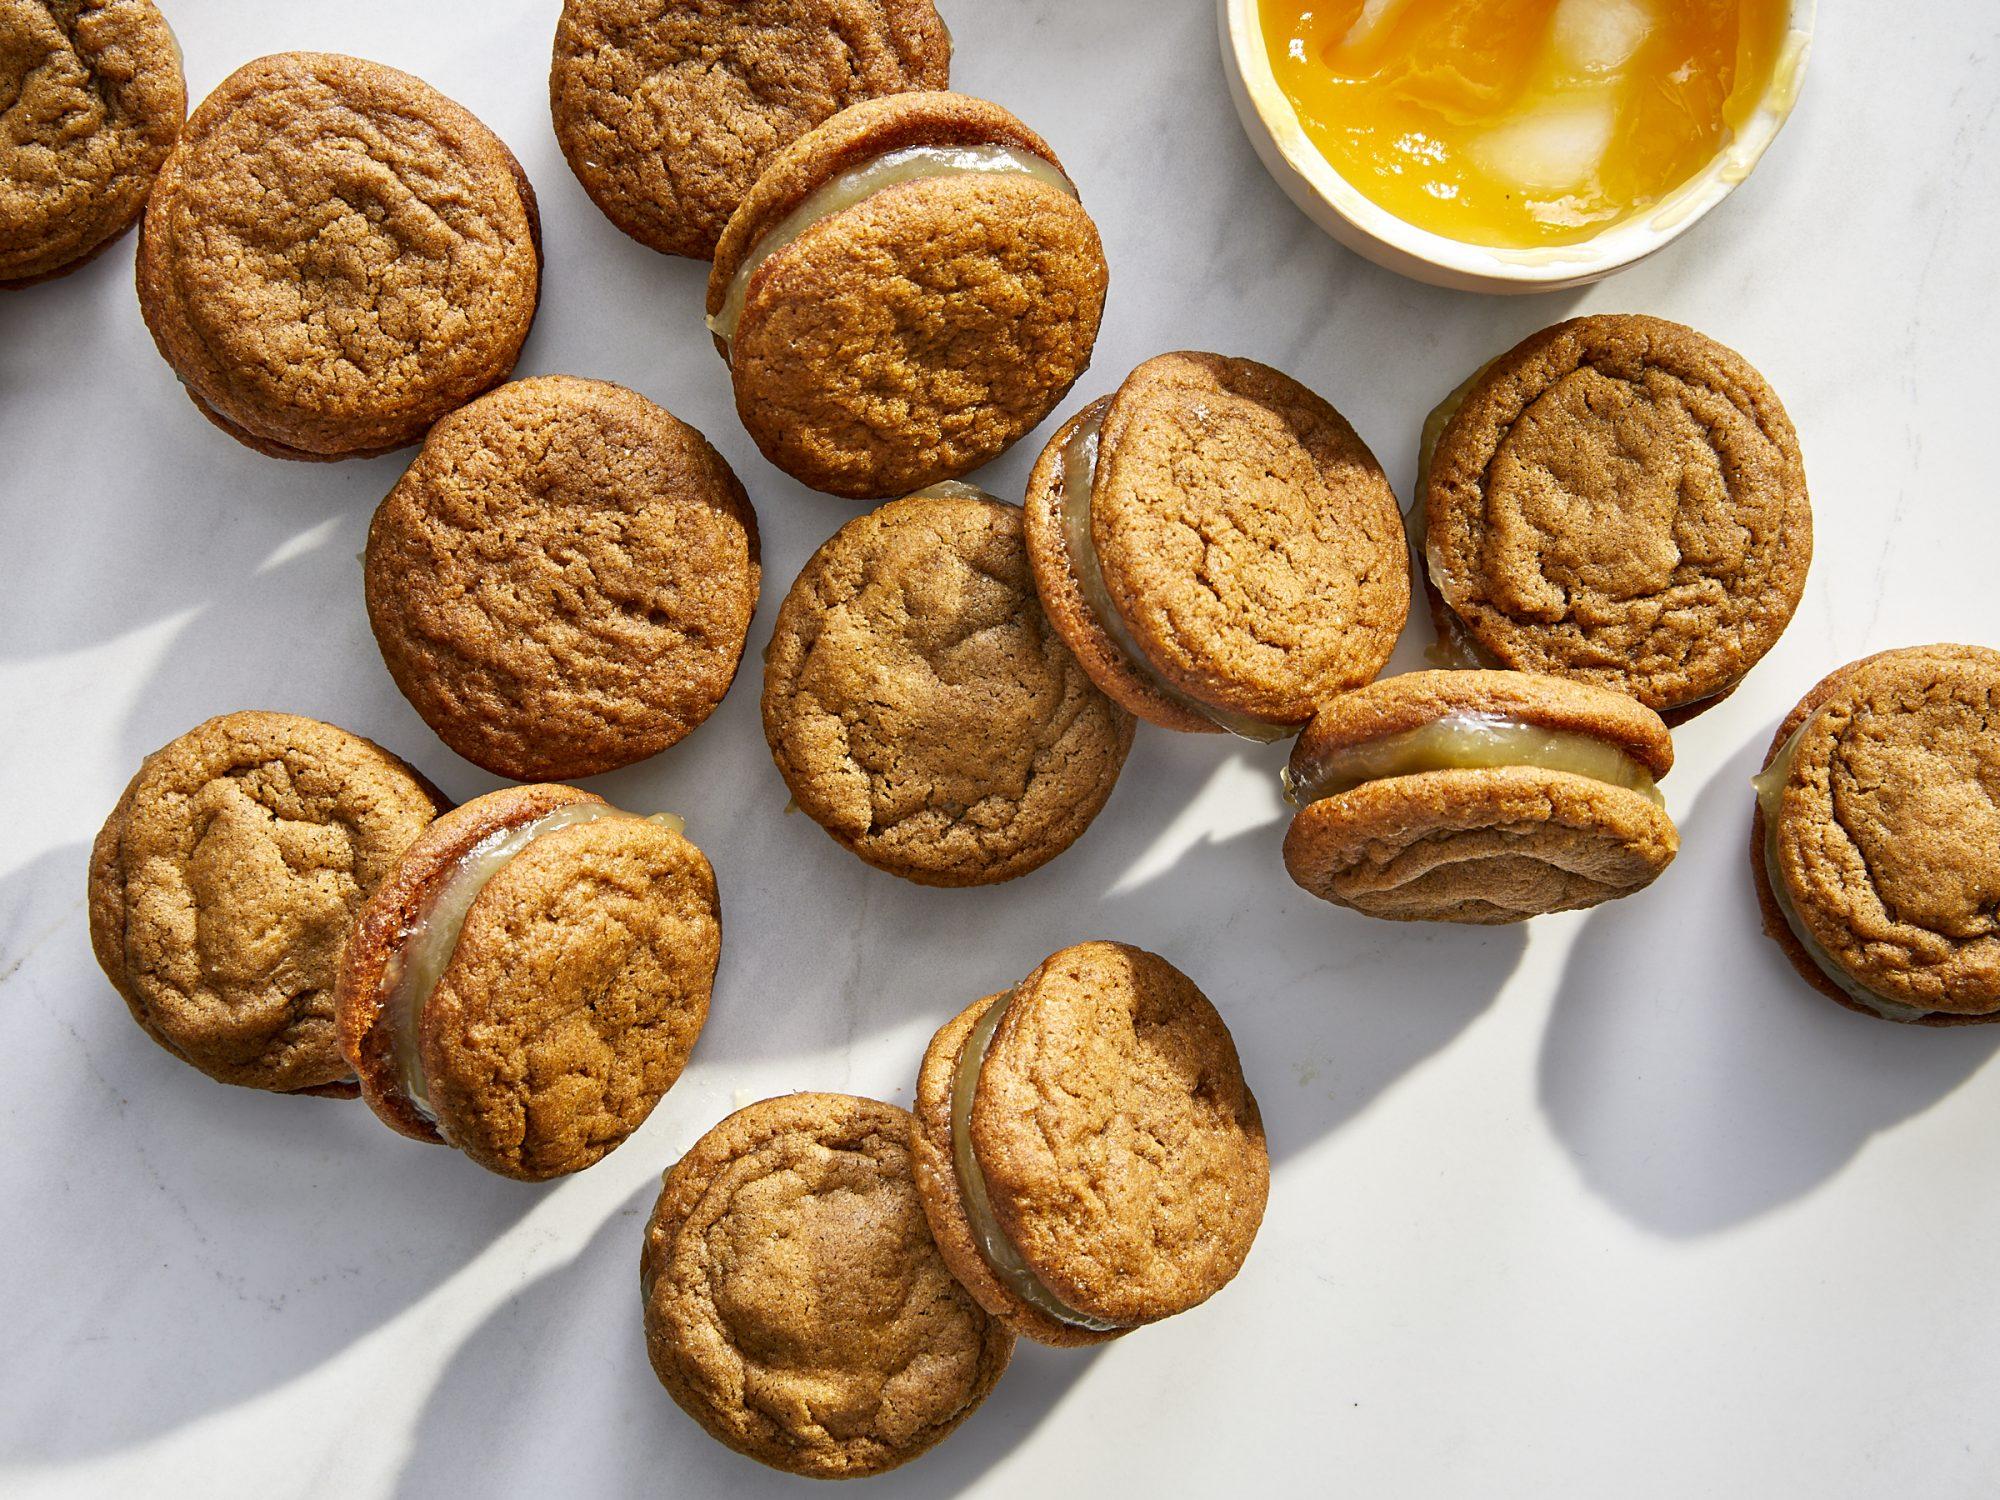 mr - Ginger-Lemon Sandwich Cookies Image